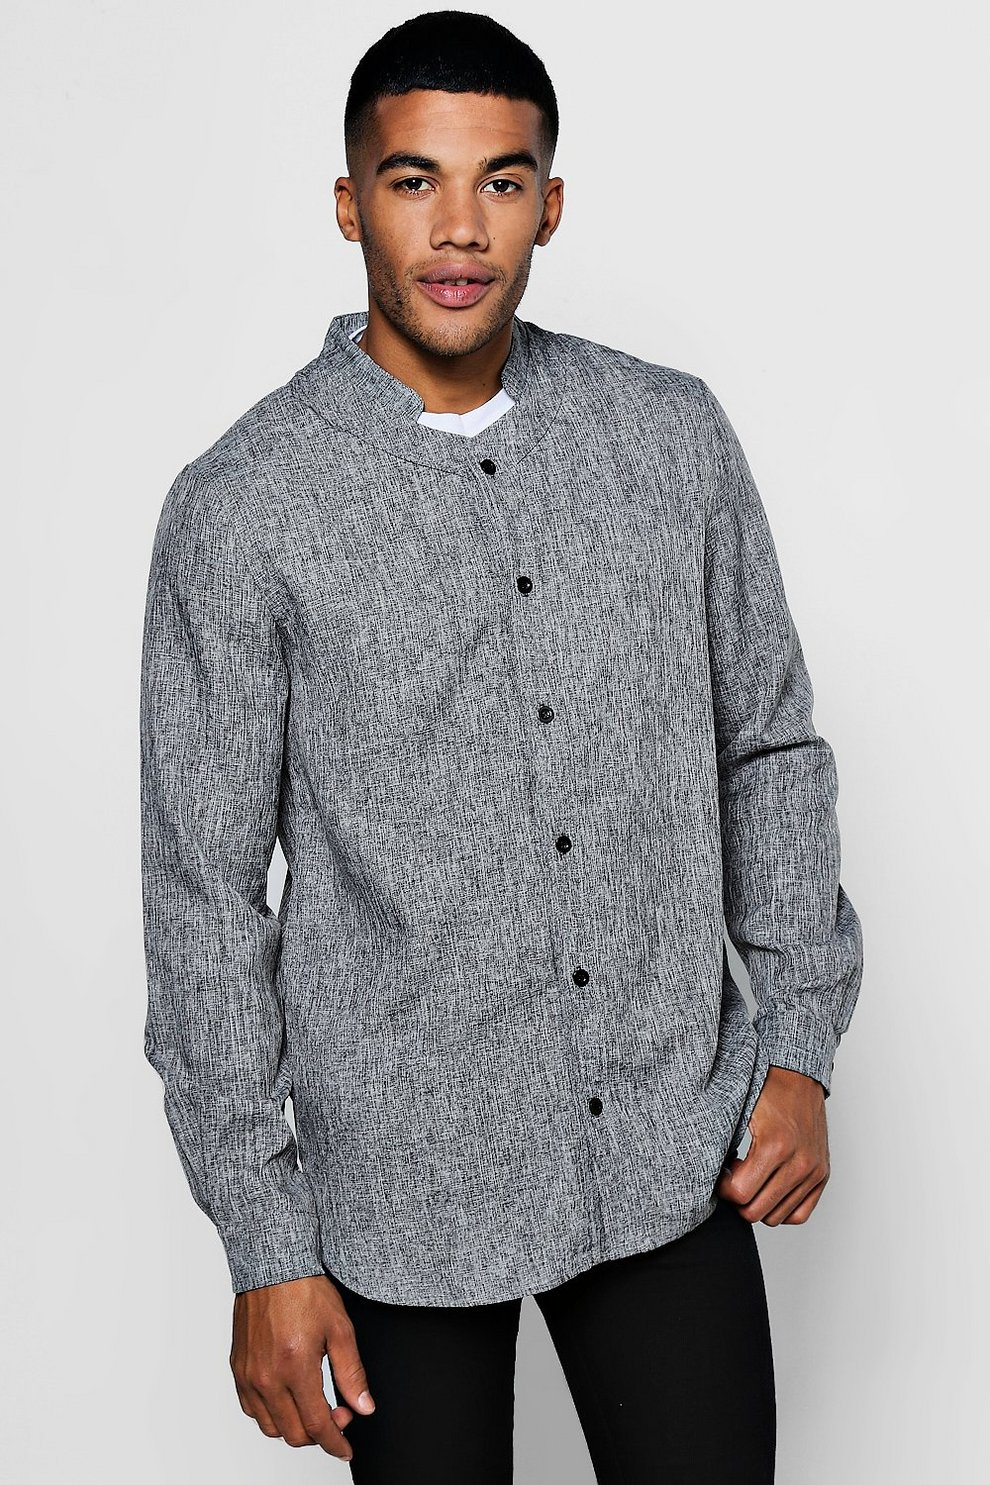 c120790c40e317 Mens Black Textured Longline Mandarin Collar Shirt With Curved Hem